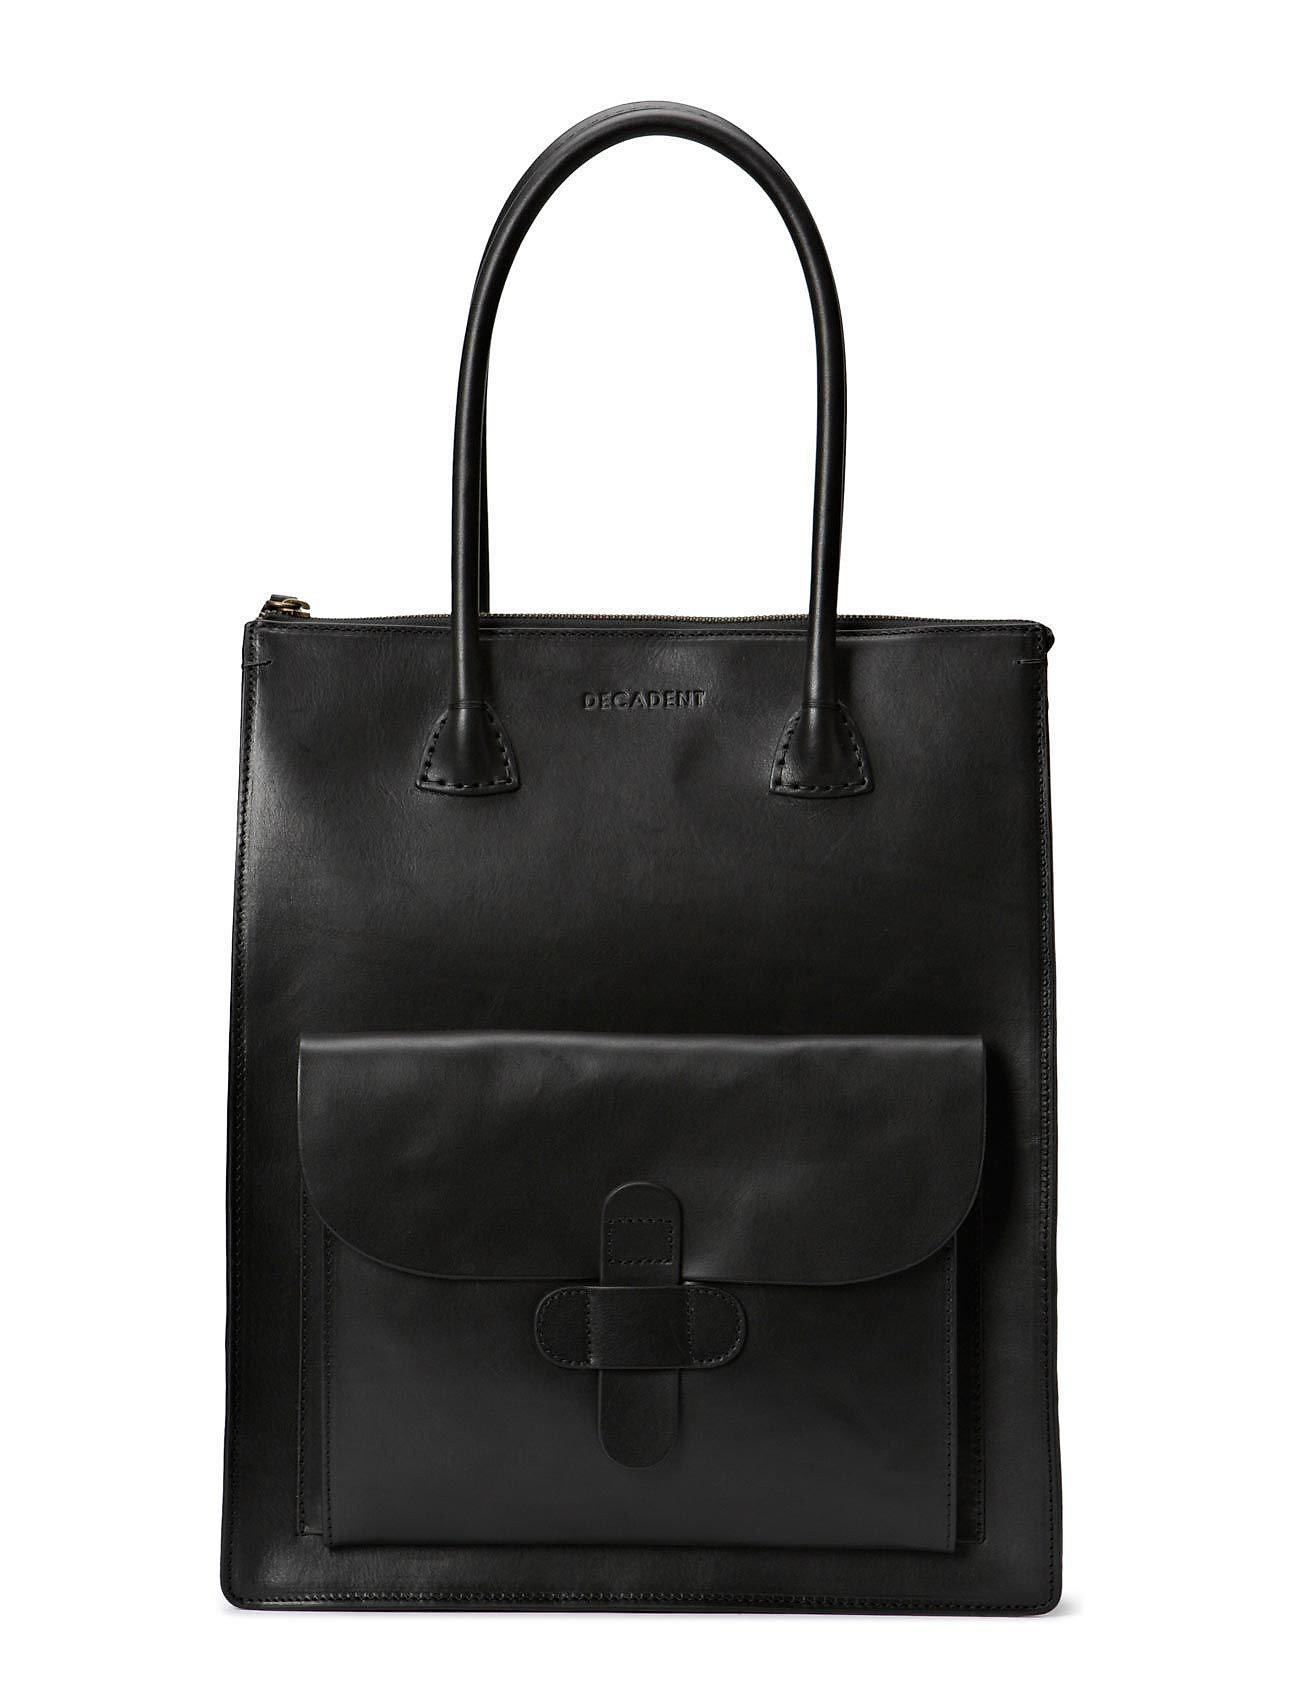 Decadent Working Bag One Pocket